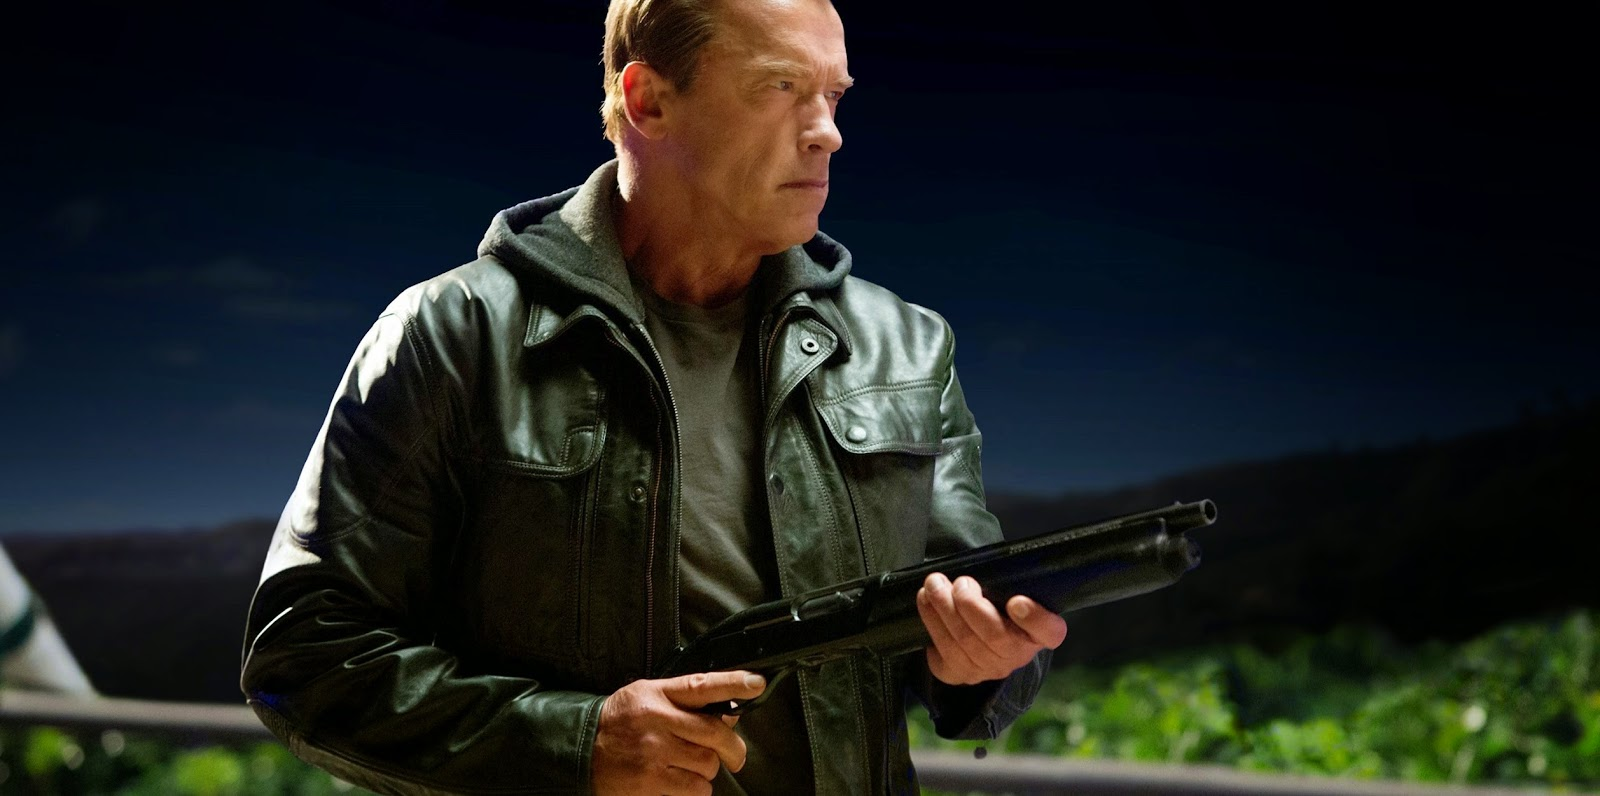 No comercial estendido de O Exterminador do Futuro: Gênesis, Schwarzenegger tenta salvar o mundo